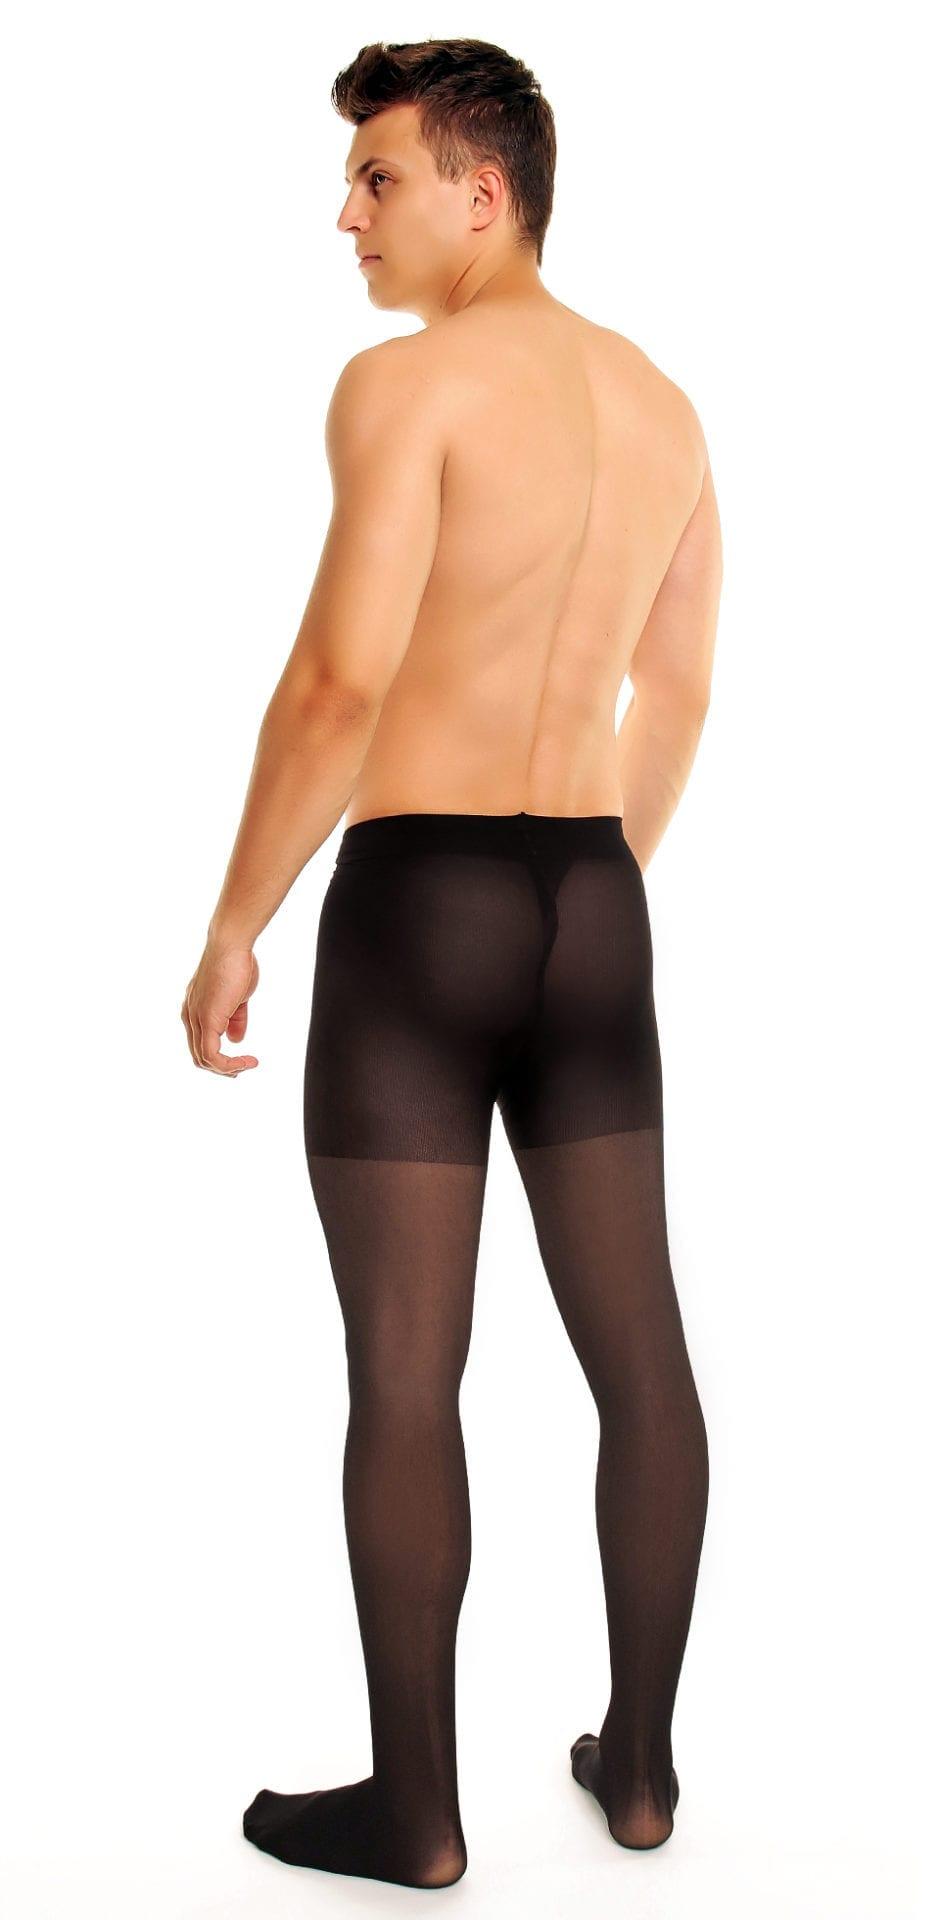 Men's Support 70 tights 70 denier black back view full body